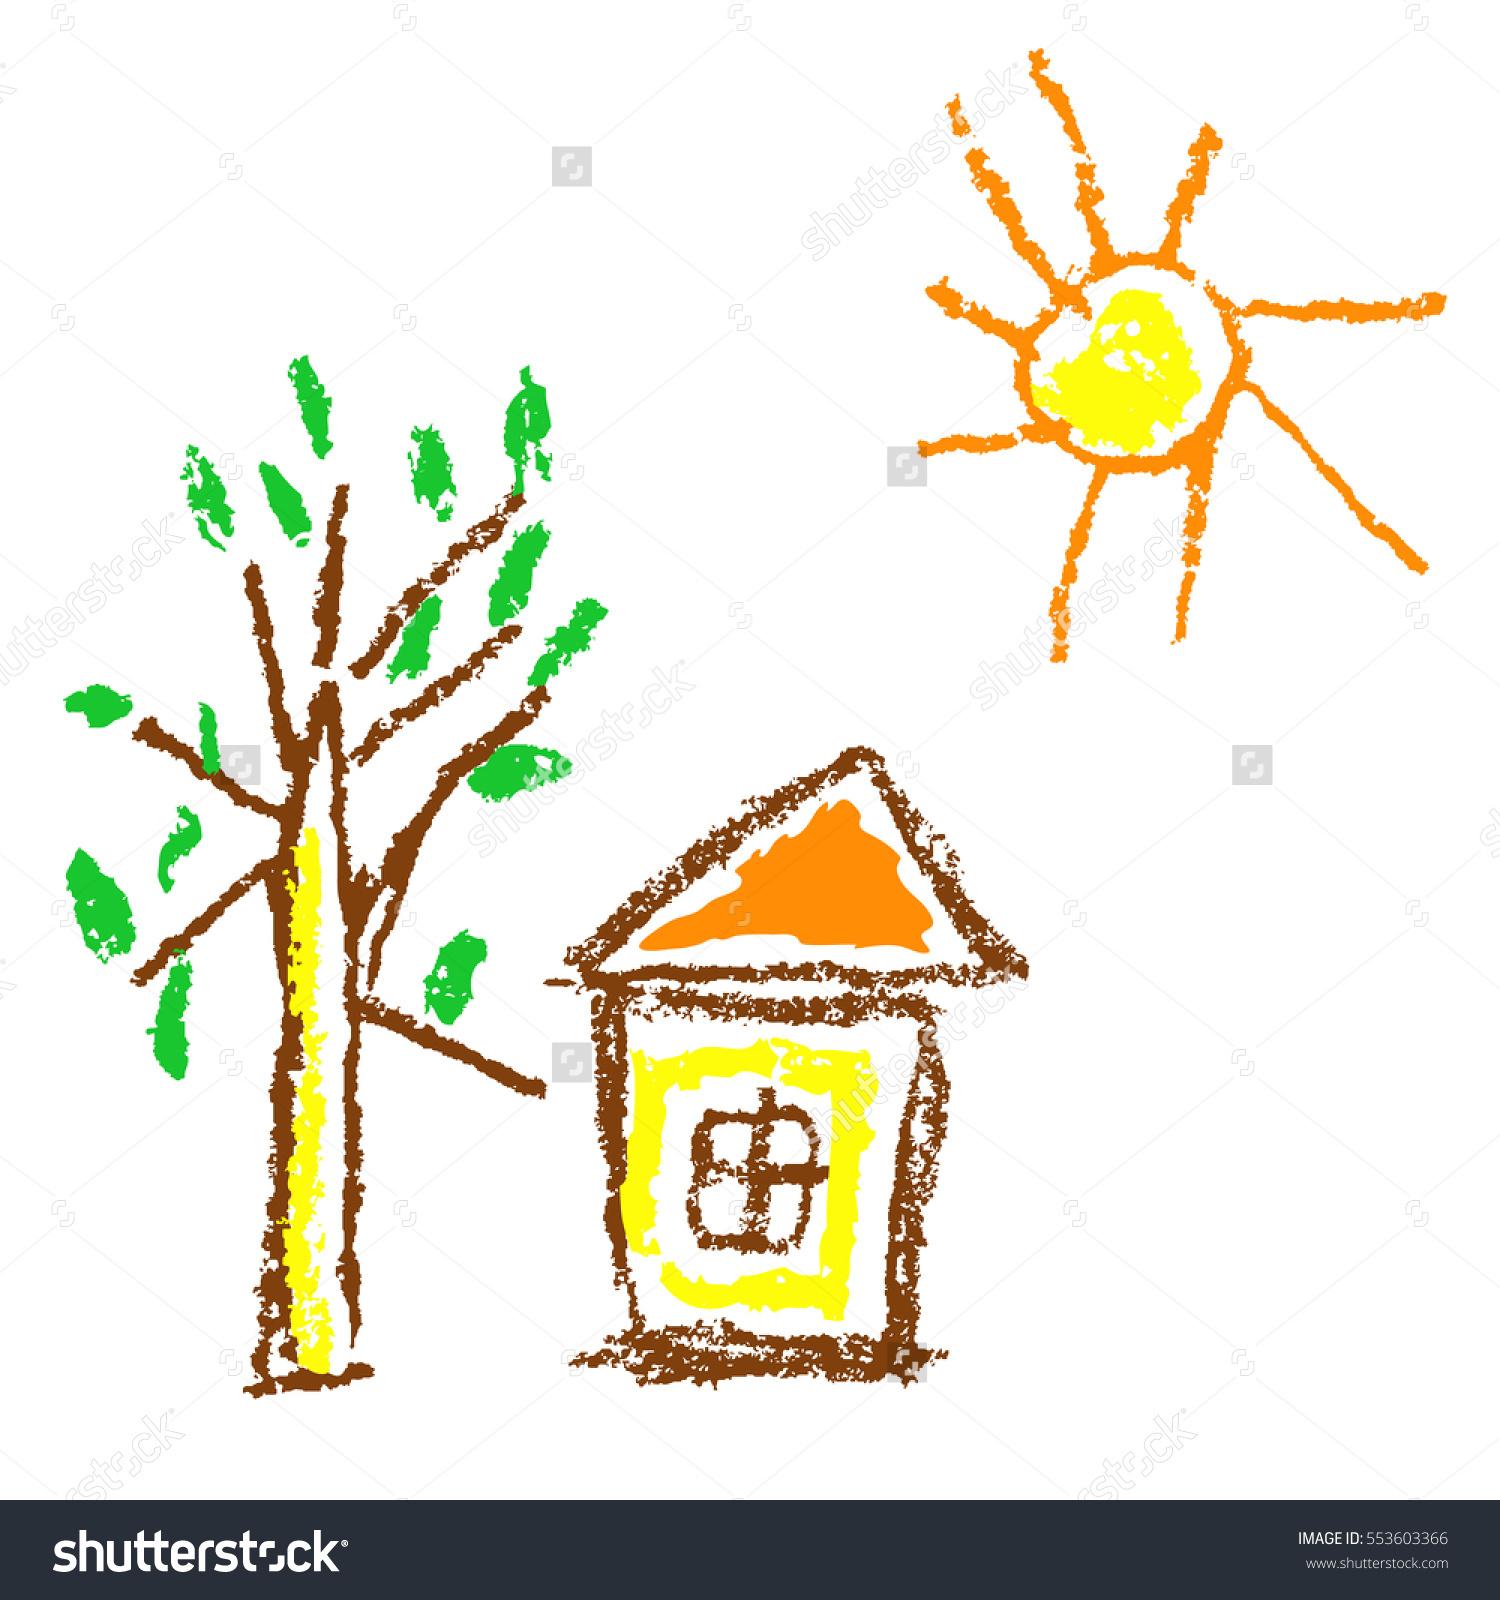 Wax Crayon Like Kids Hand Drawn Stock Vector 553603366.